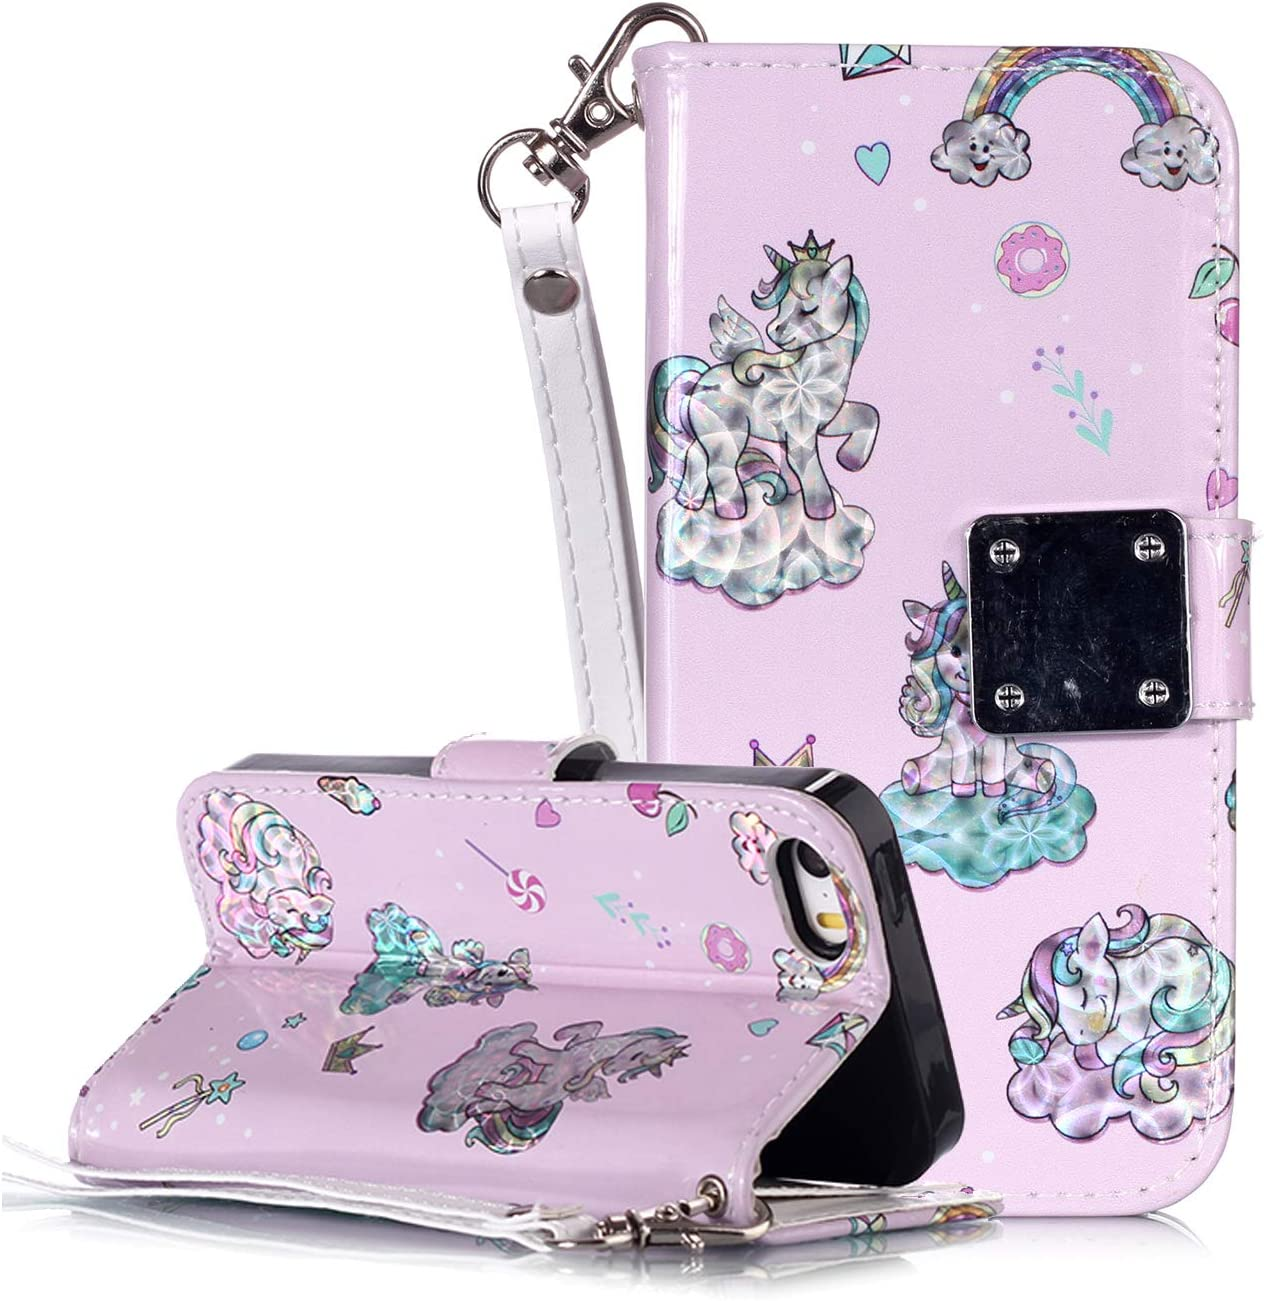 for iPhone 6 Plus 5.5 Case Cute Cat SevenPanda Leather Glitter Case iPhone 6 Plus PU Leather Book Style Stand Case Folio Flip Wallet Case for iPhone 6S Plus iPhone 6S Plus Protective Cases